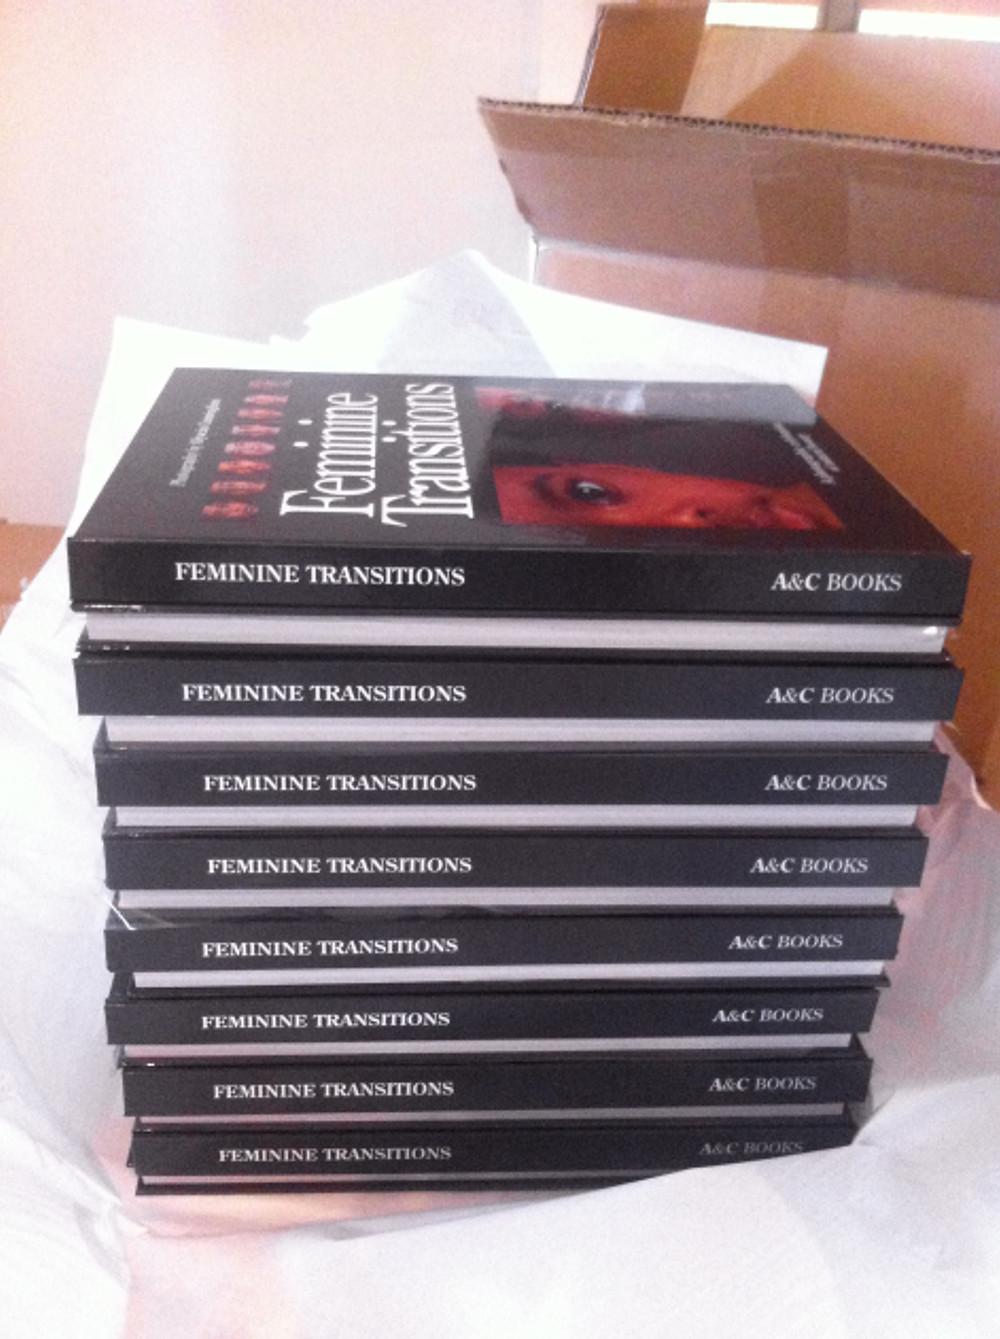 Feminine Transitions books and shipment box